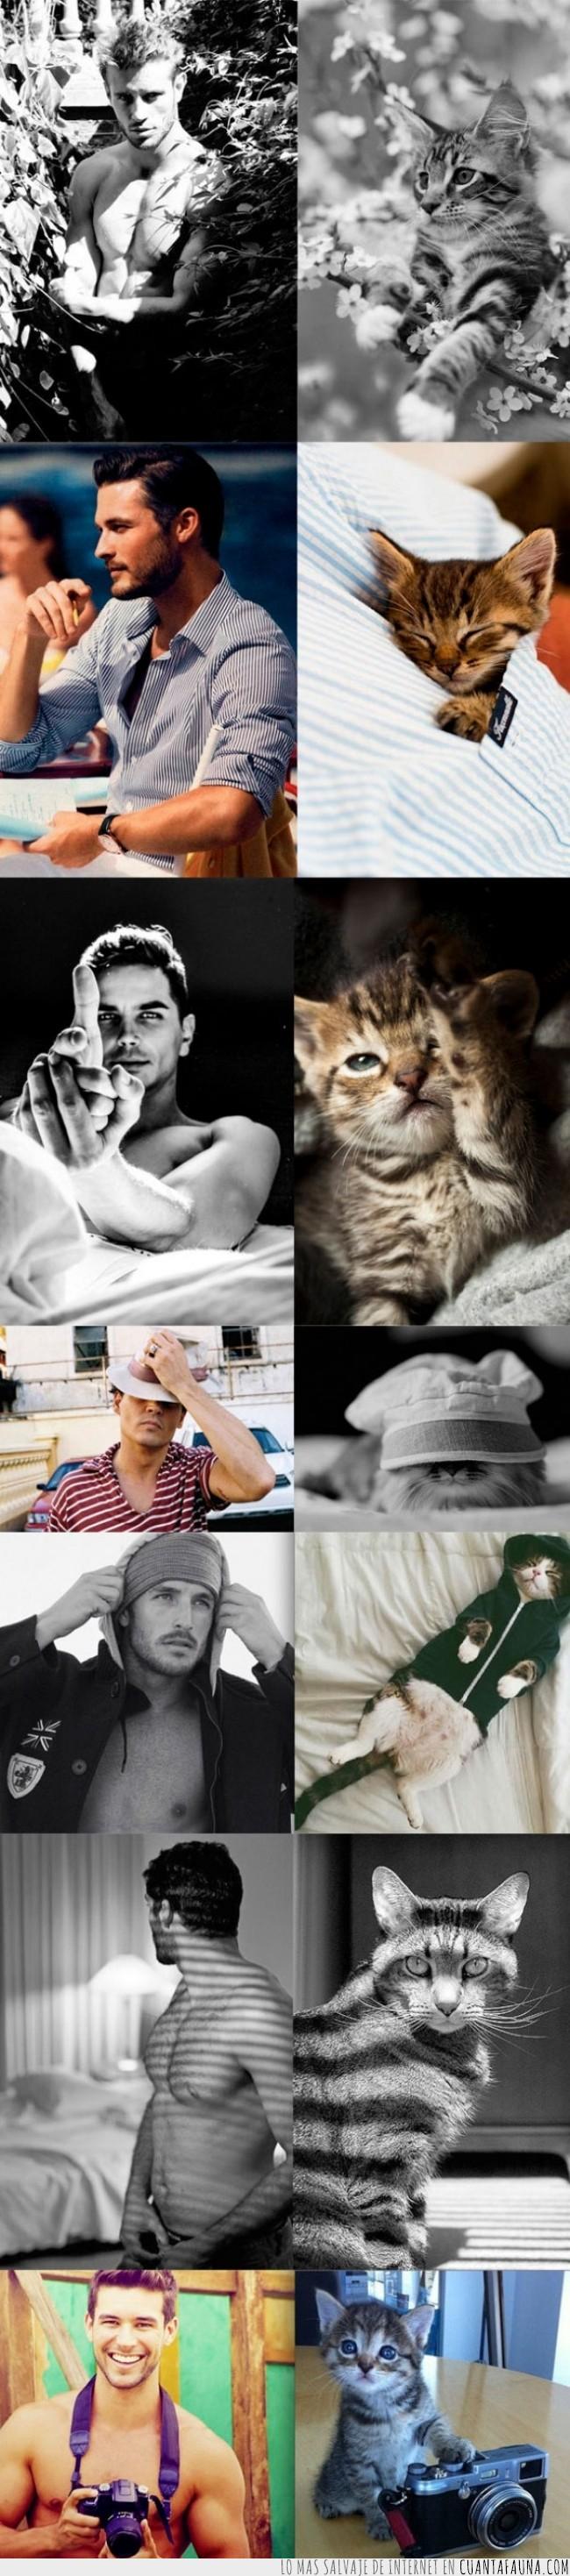 adoptar,belleza,chicos,fotogénicos,gatos,guapos,modelos